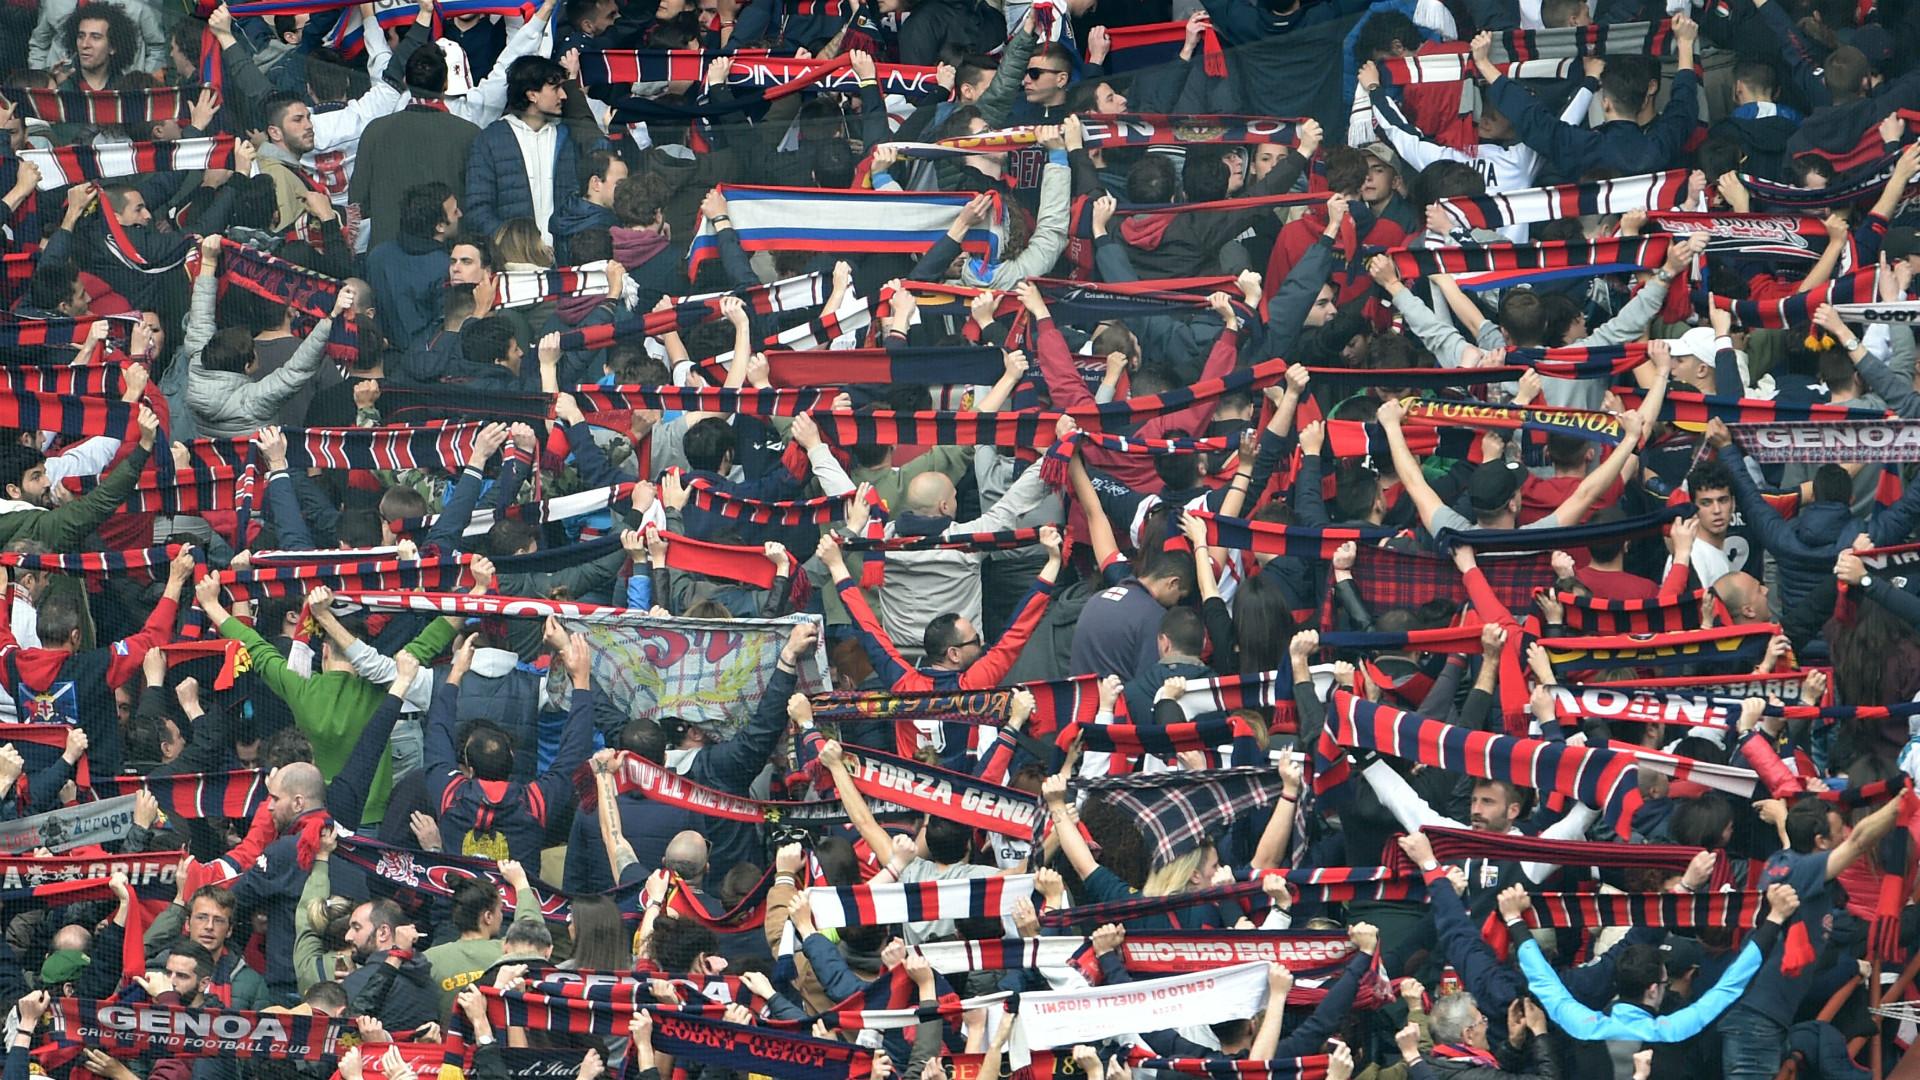 Genoa supporters